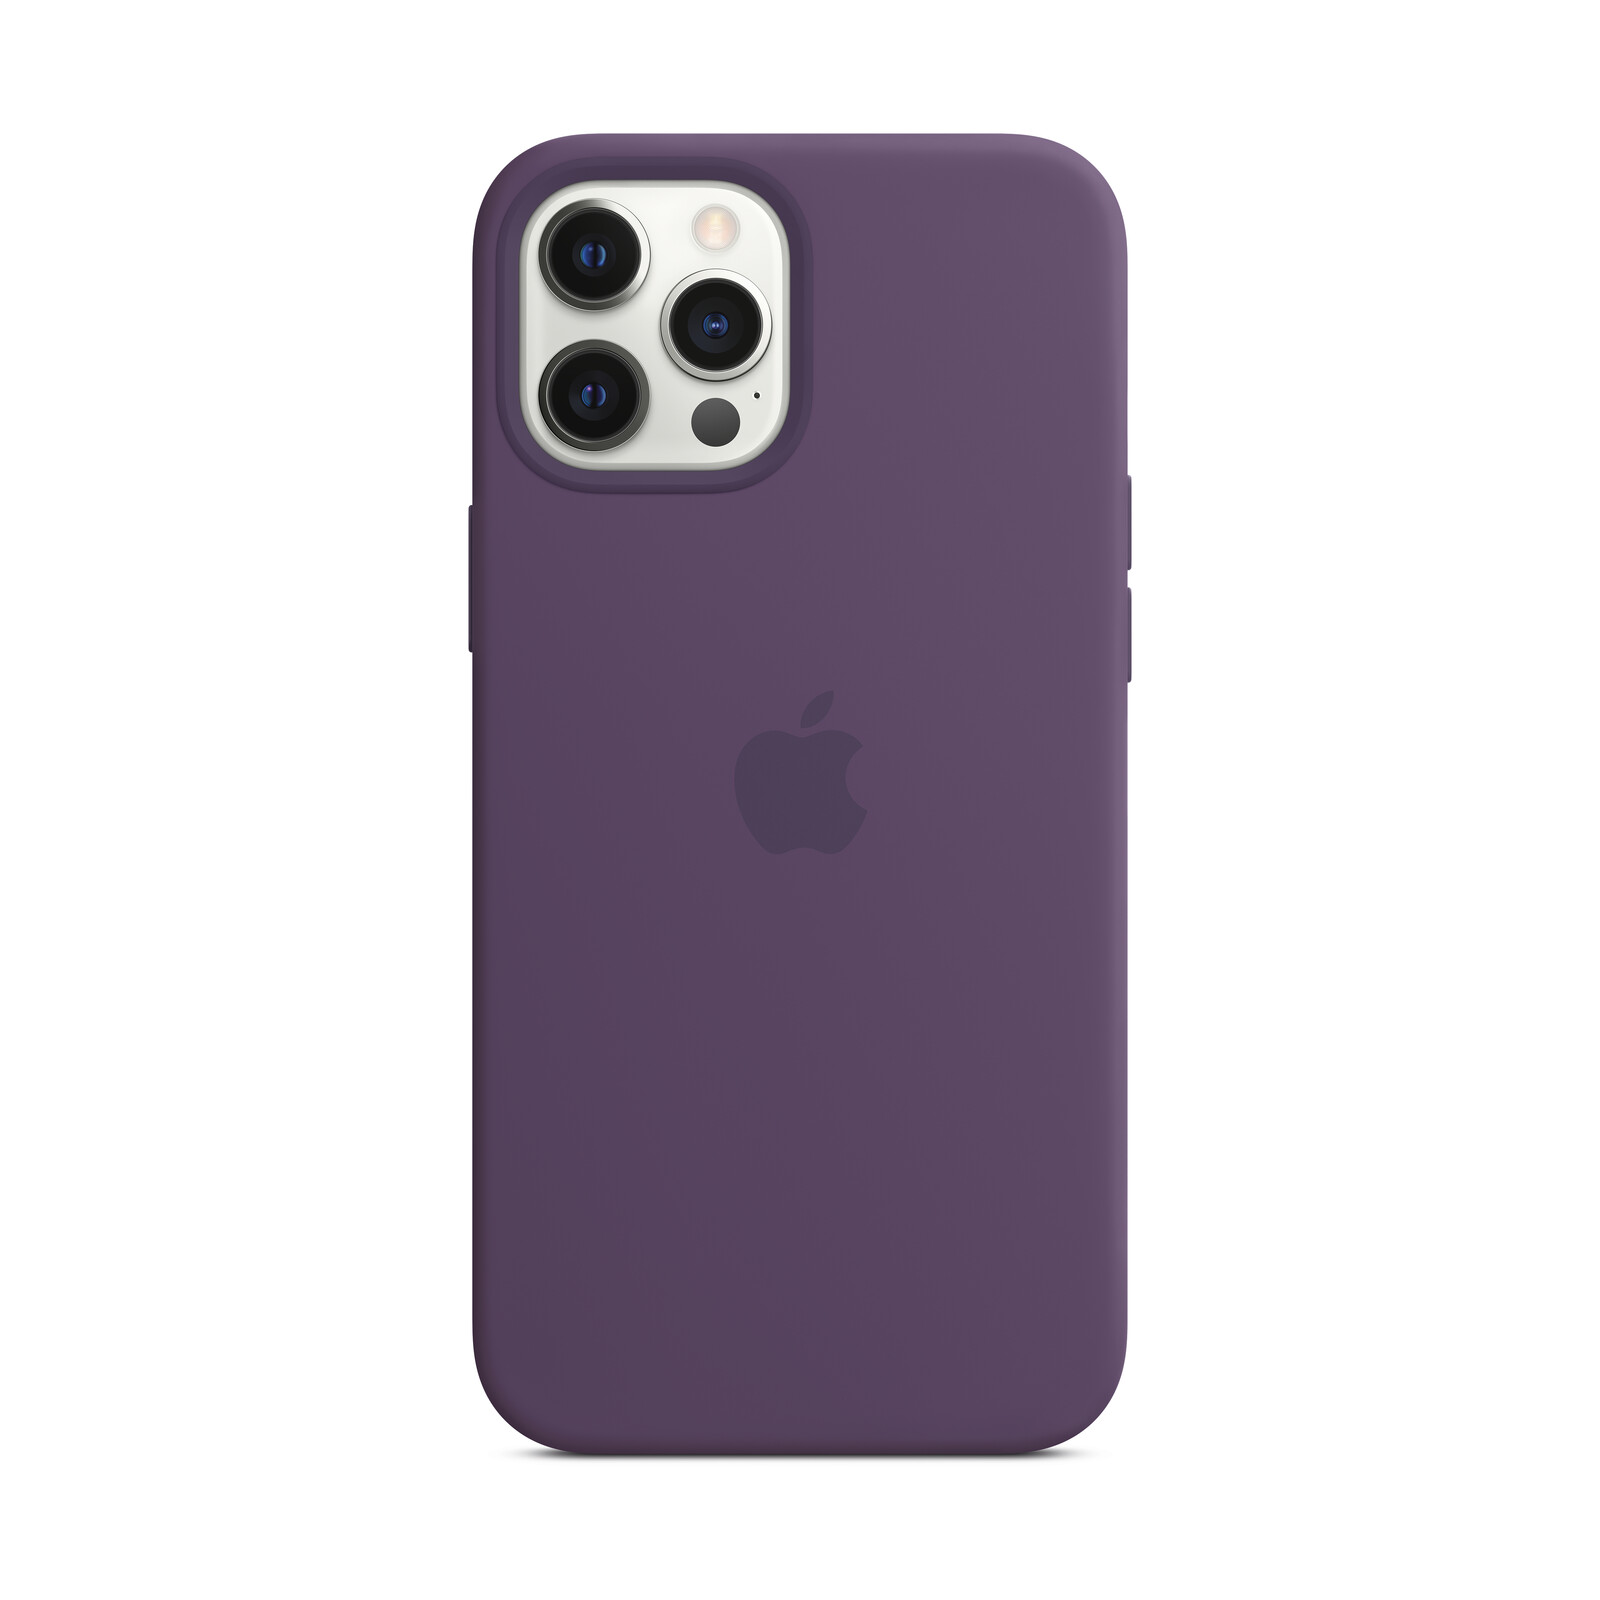 Apple iPhone 12 Pro Max Silikon Case mit MagSafe amethyst